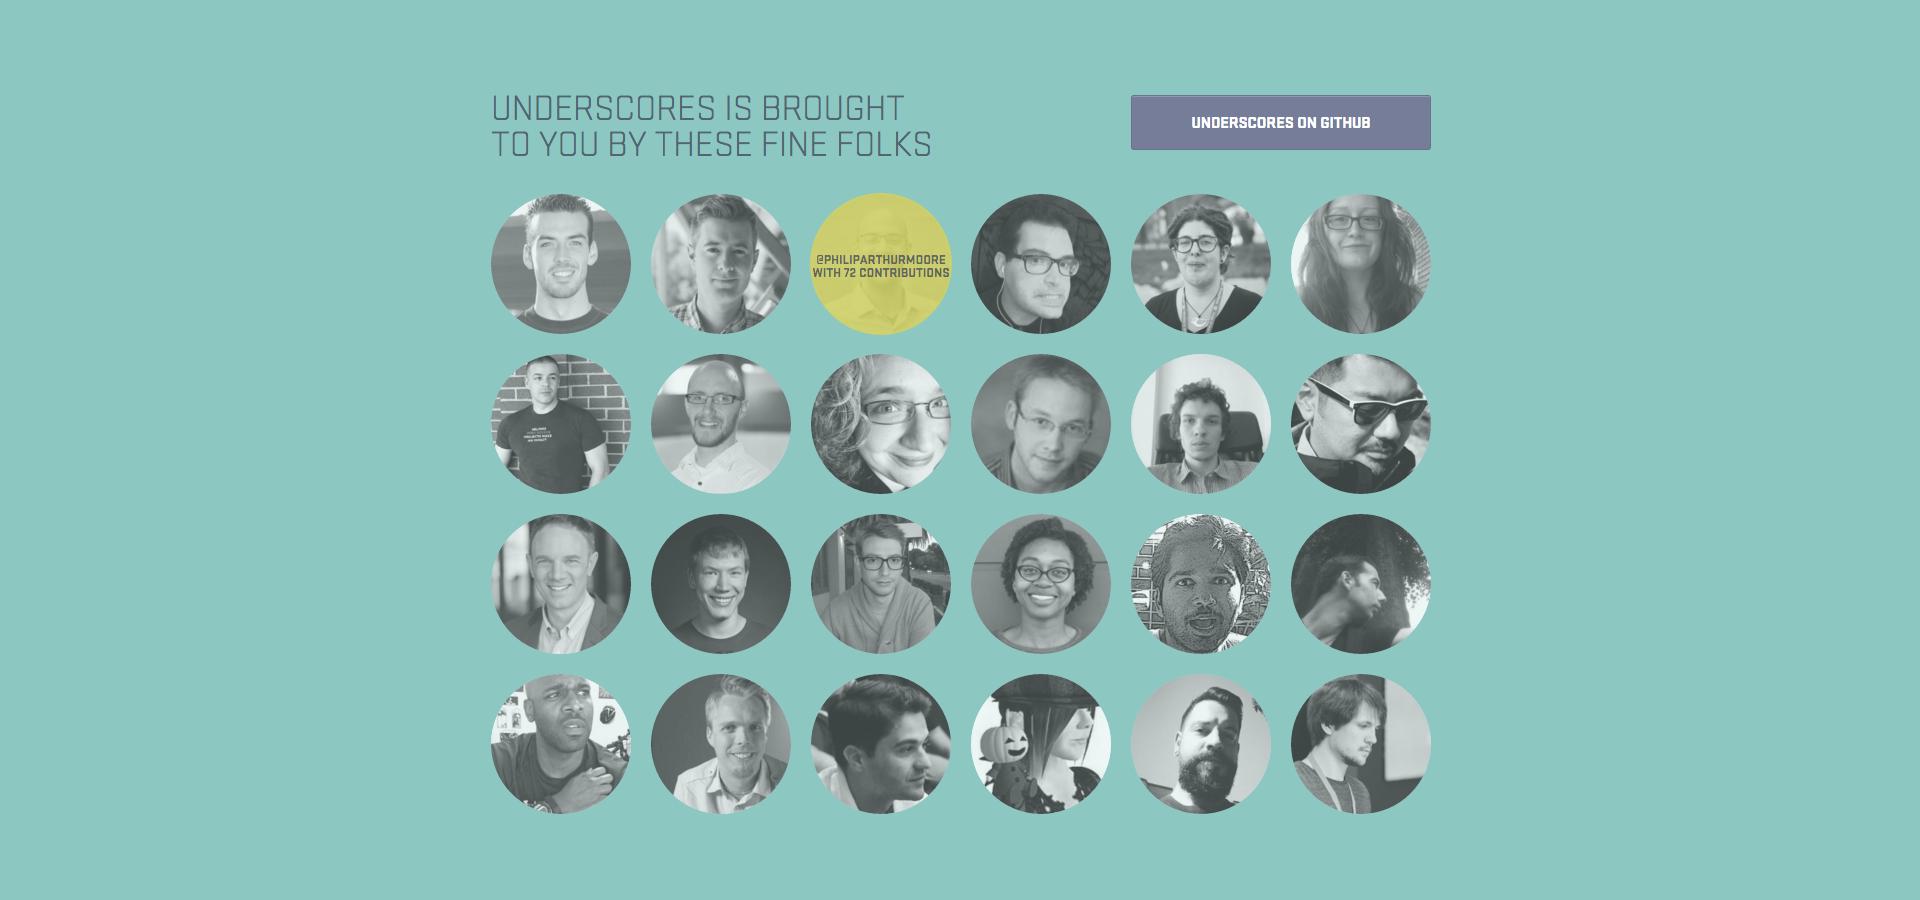 Underscores.me - Contributors